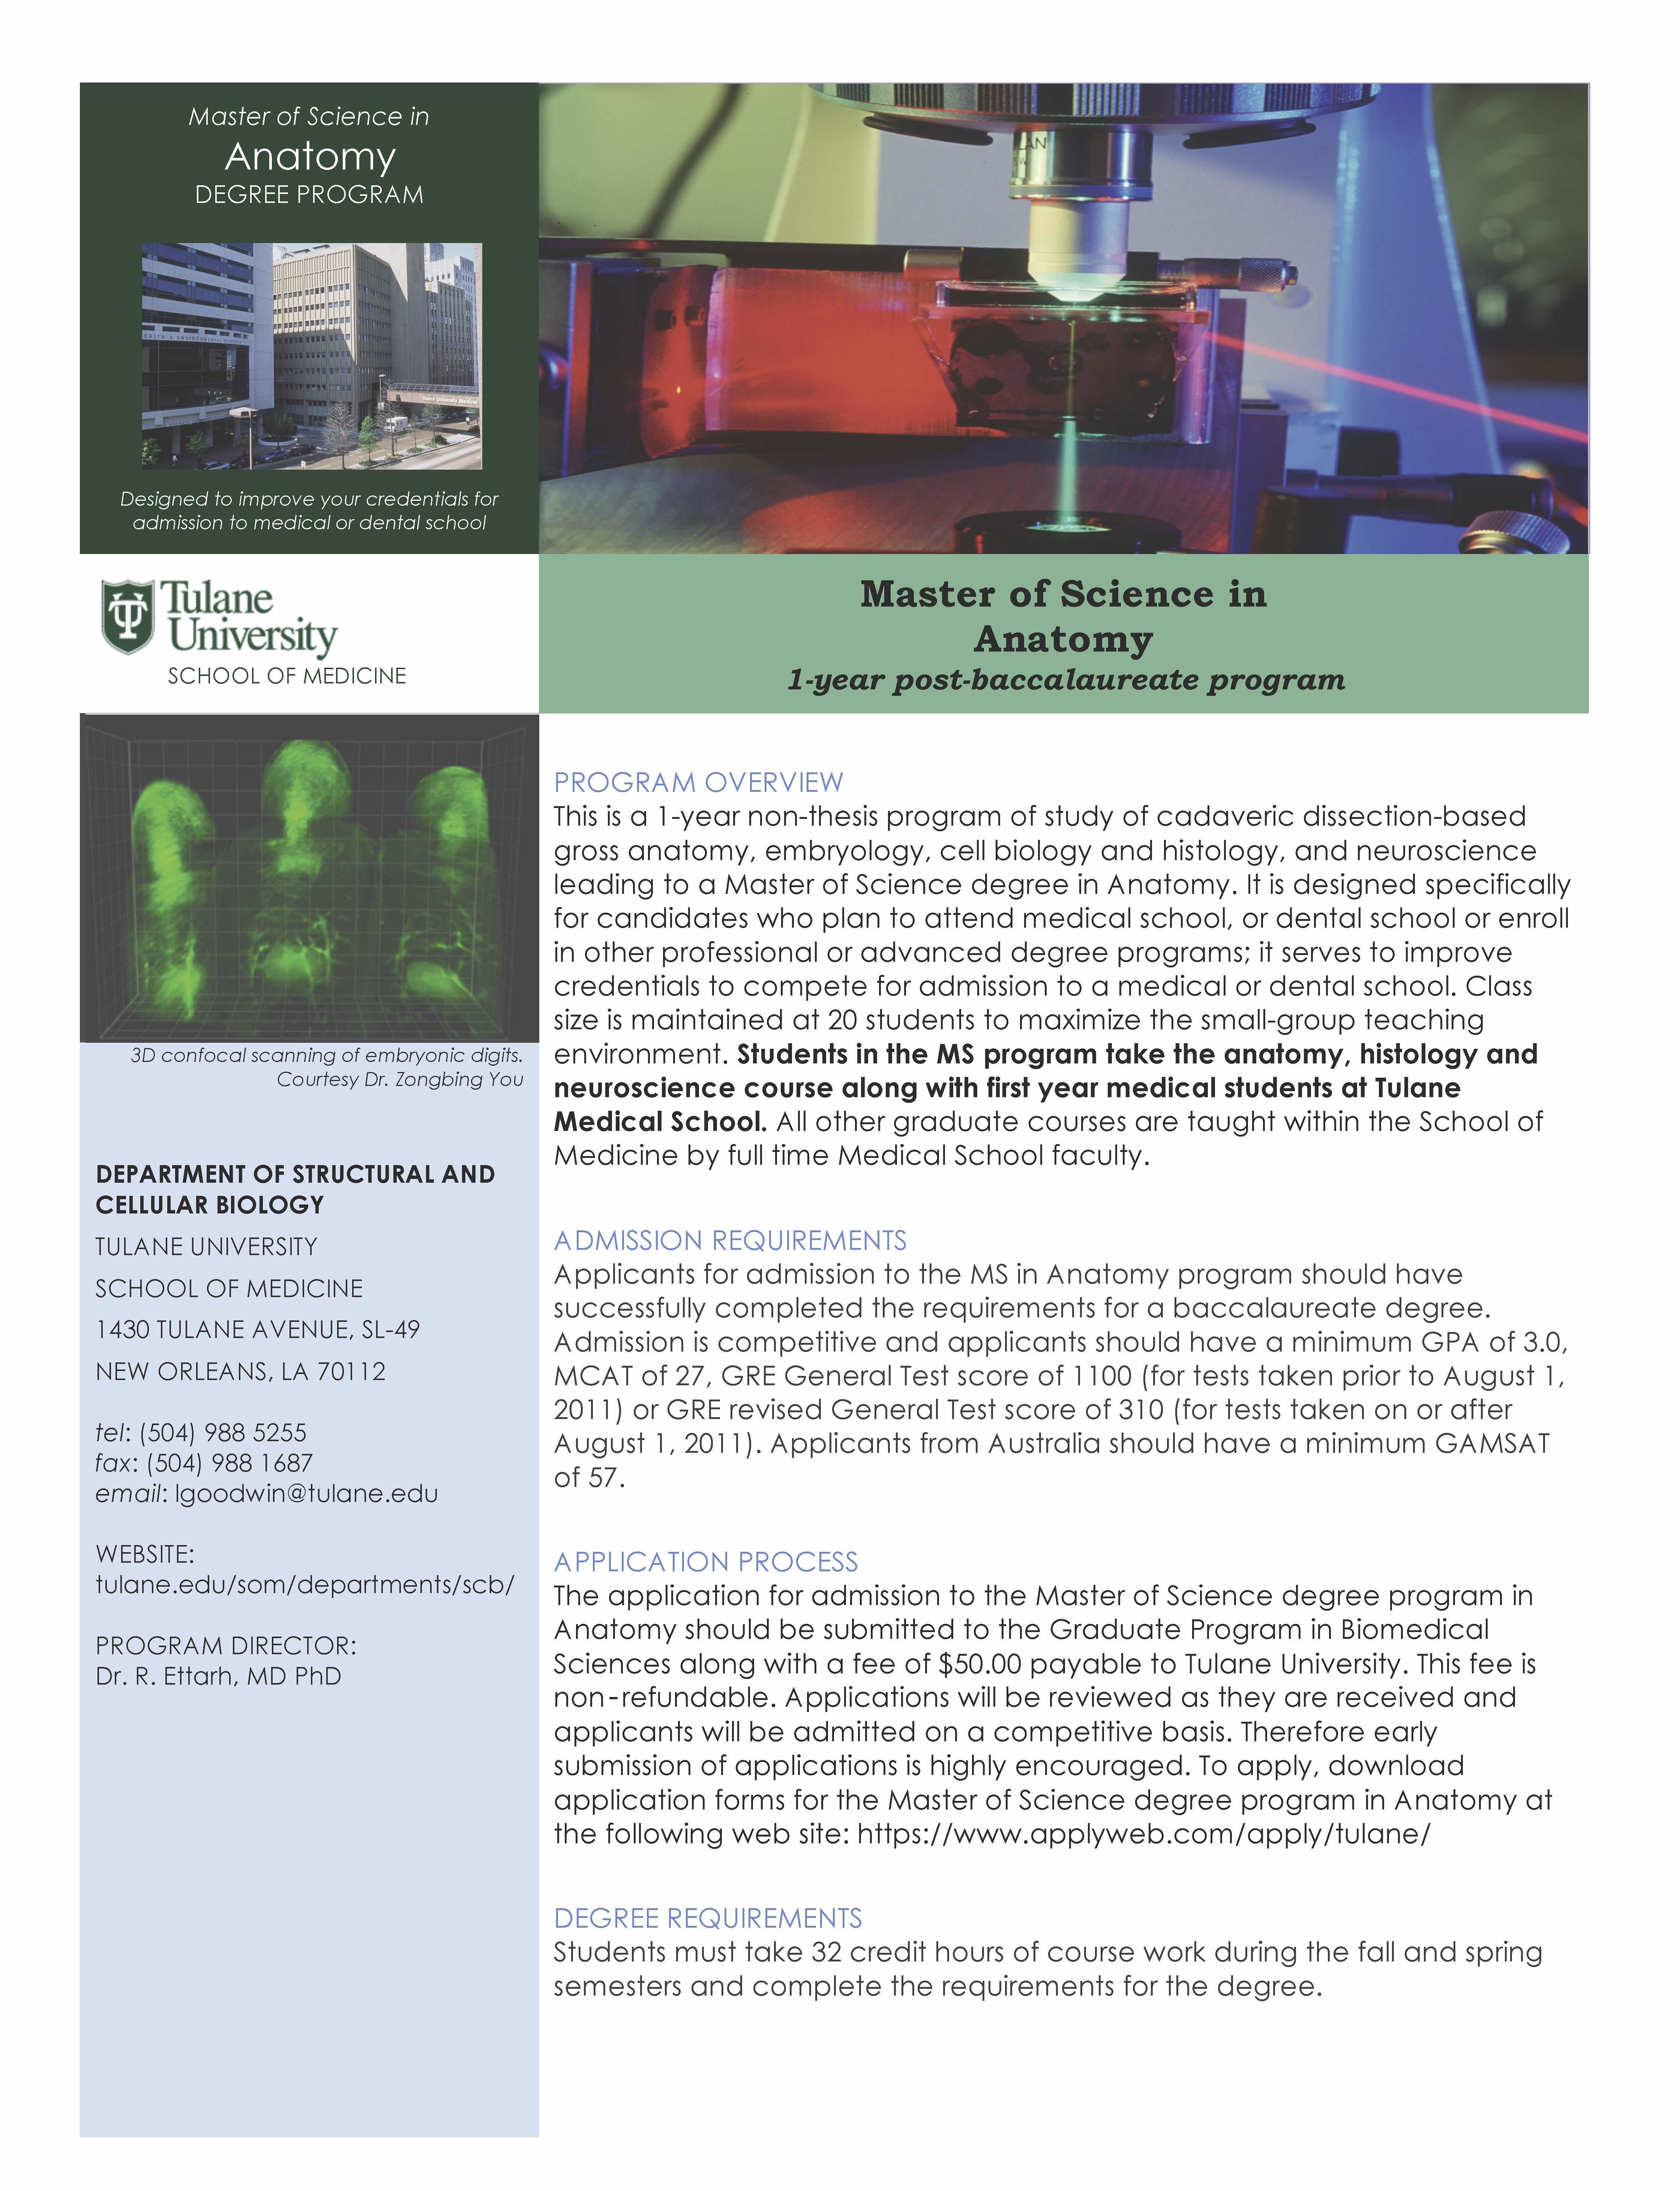 MS Anatomy at Tulane | UC San Diego - Biology Bulletin